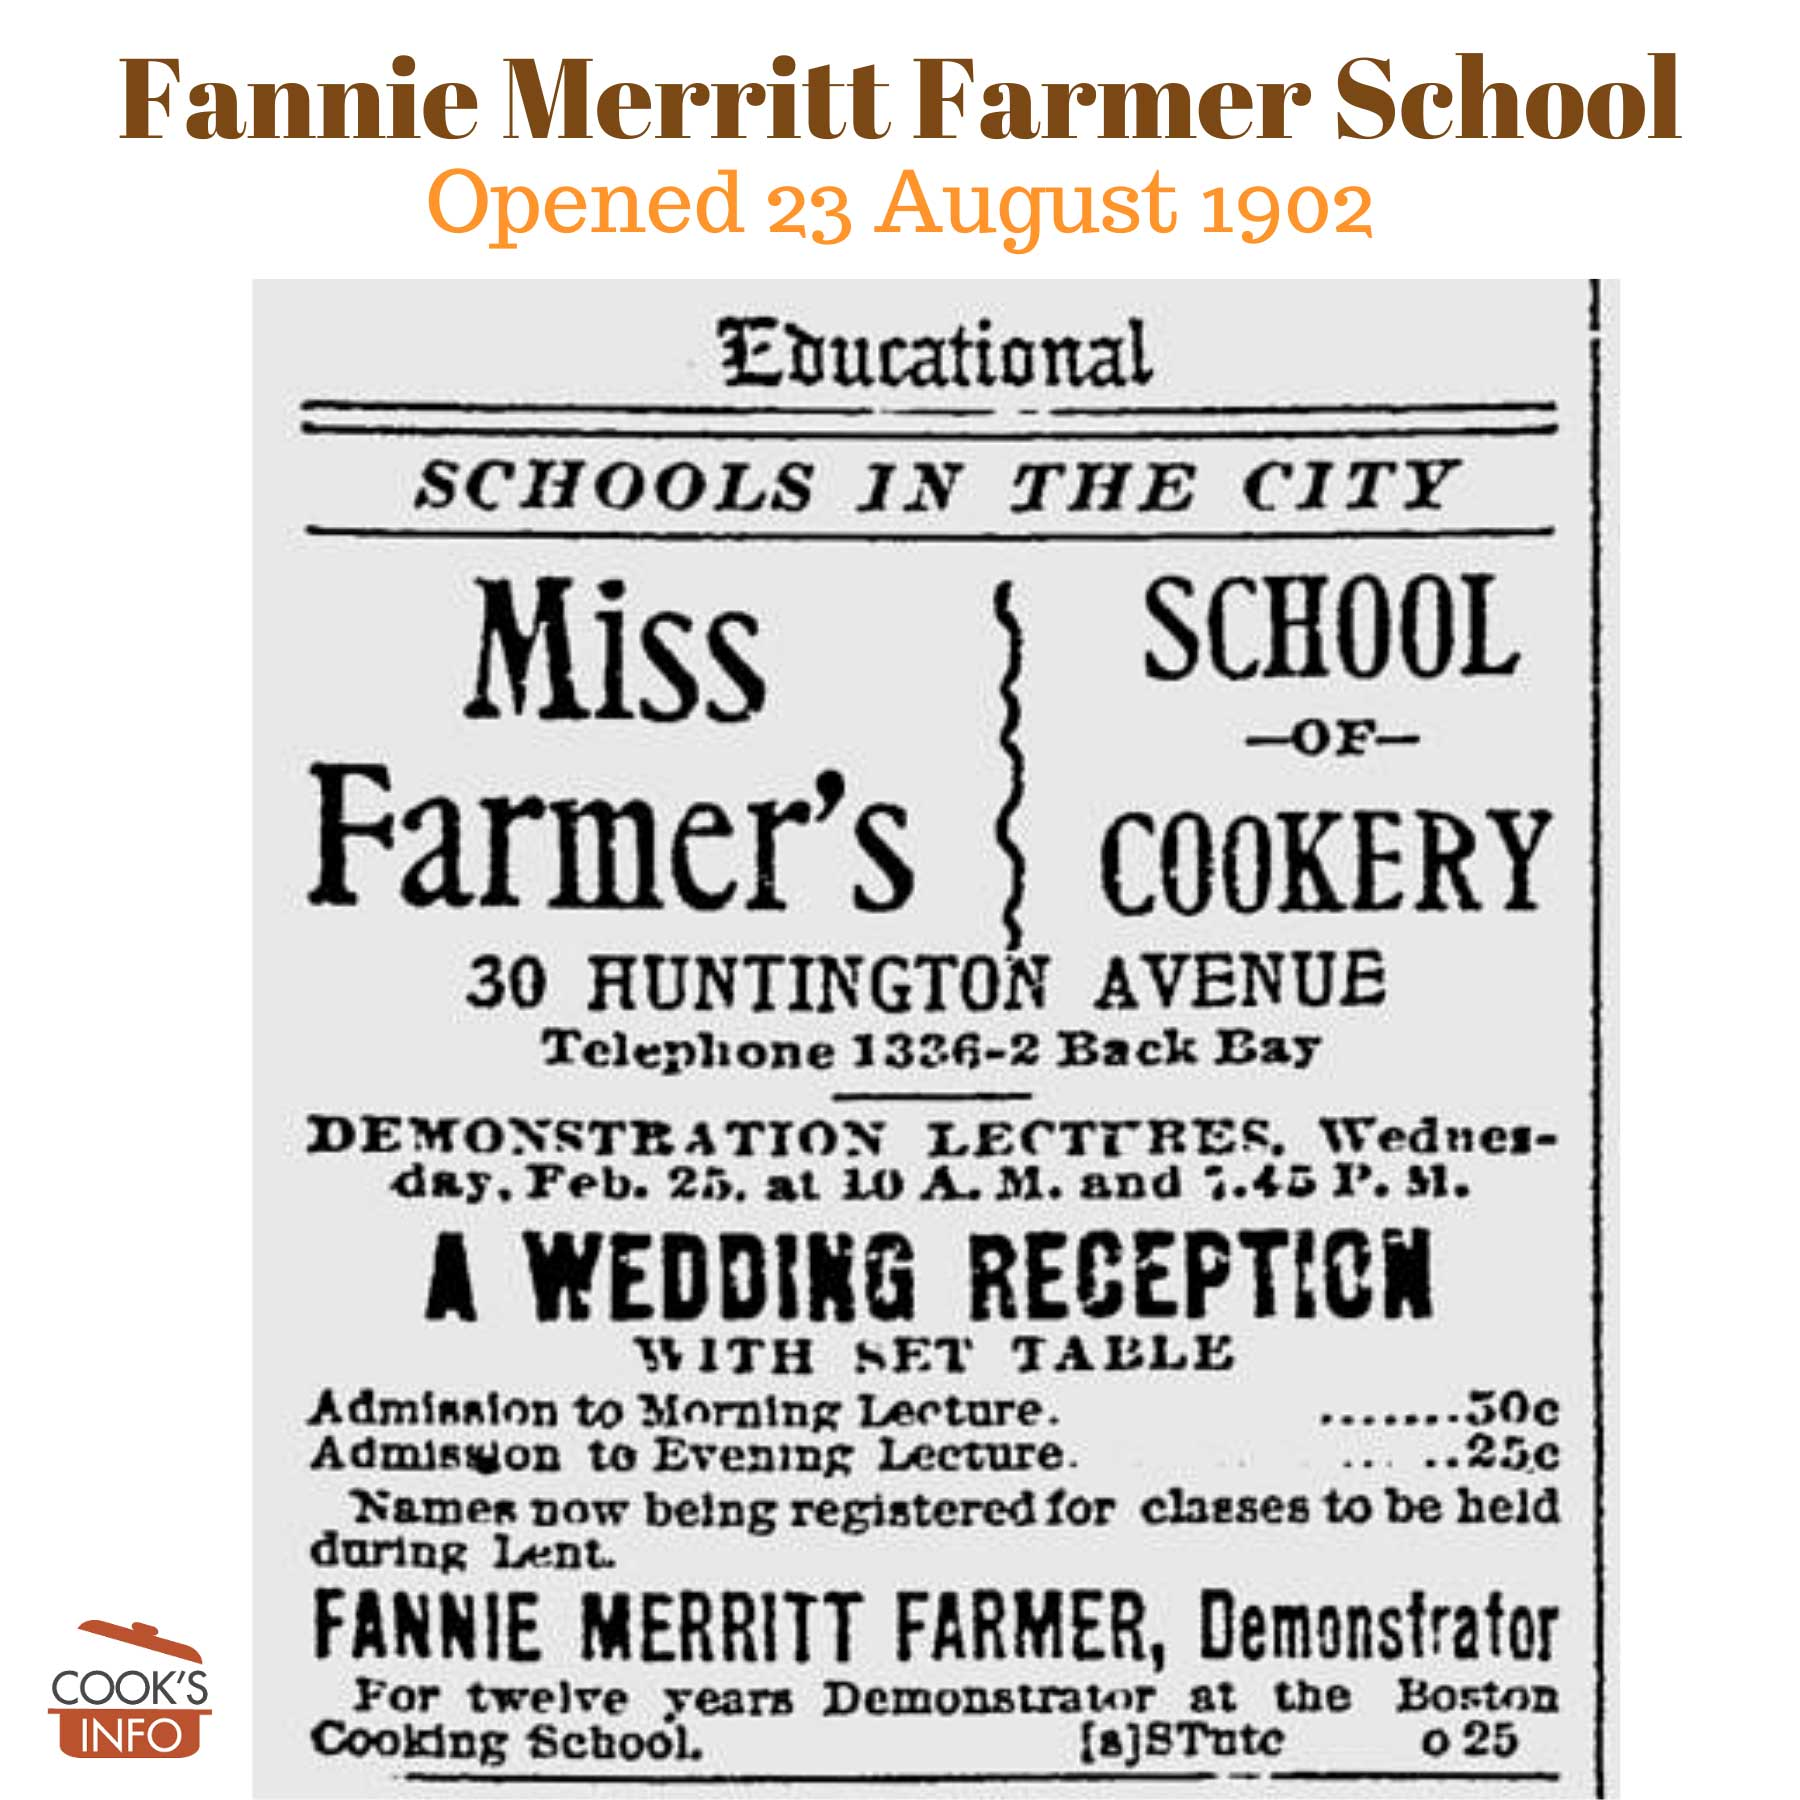 Fannie Merritt Farmer School